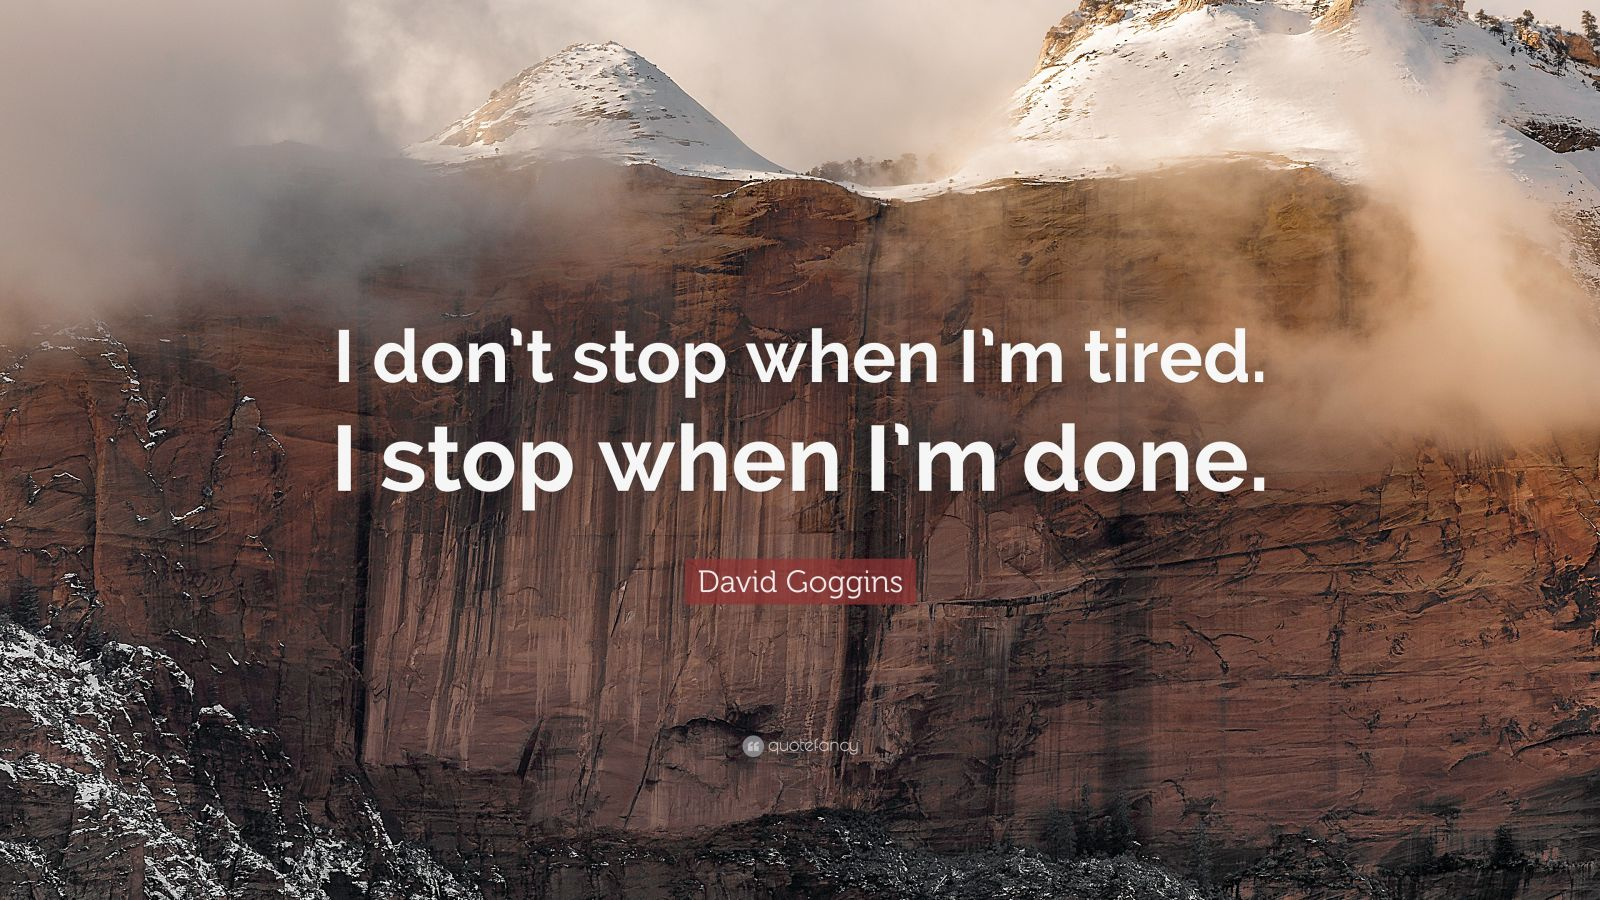 Success Quotes Desktop Wallpaper David Goggins Quote I Don T Stop When I M Tired I Stop